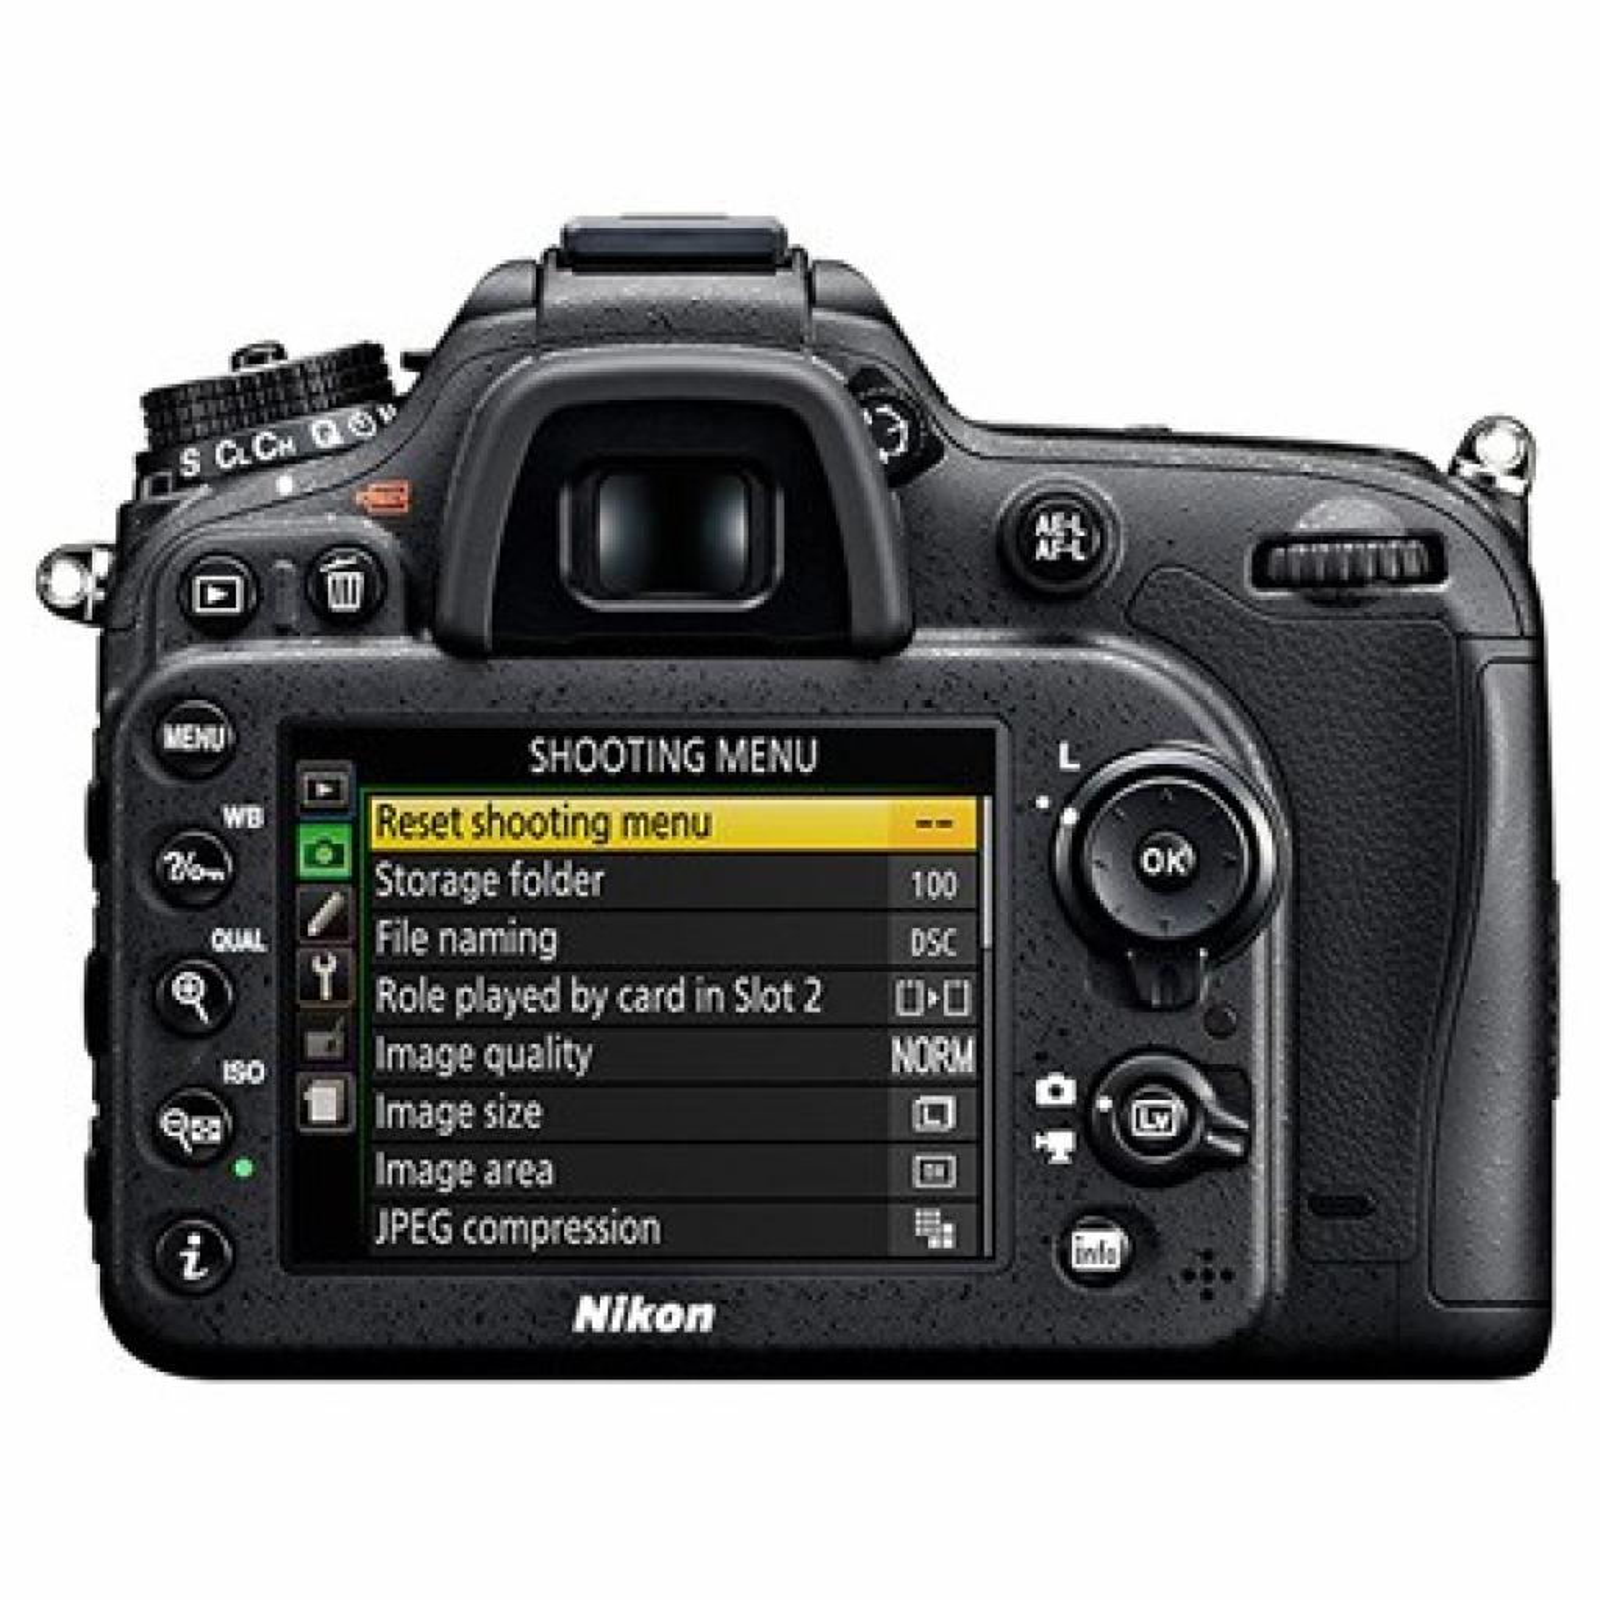 Цифровой фотоаппарат Nikon D7100 18-105 VR kit (VBA360K001) изображение 3